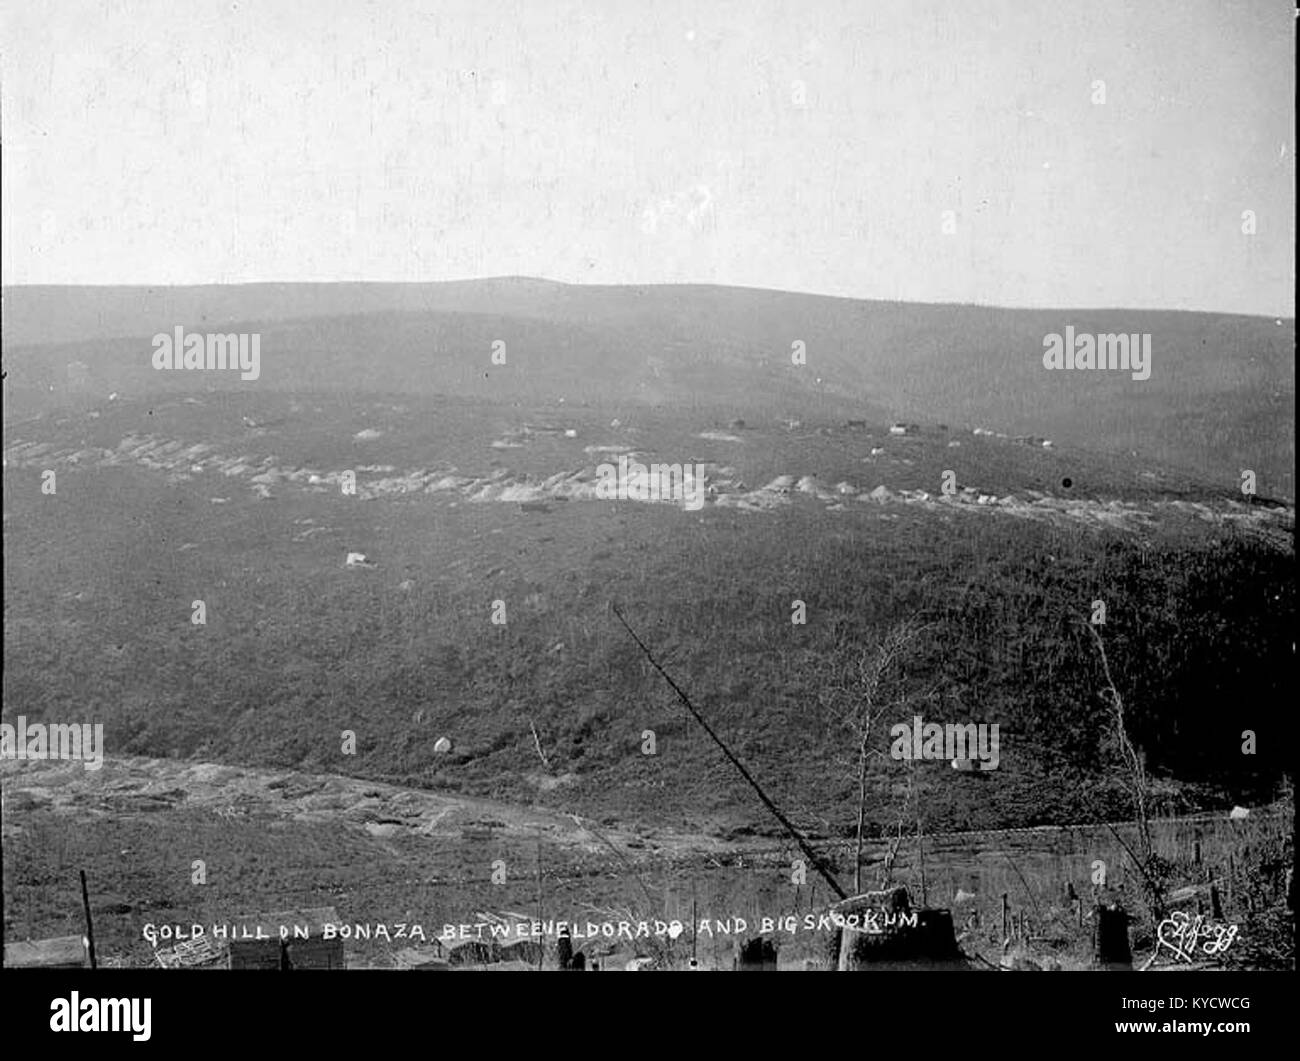 Panorama of mining claims on Gold Hill showing Bonanza Creek, Yukon Territory, ca 1898 (HEGG 524) - Stock Image